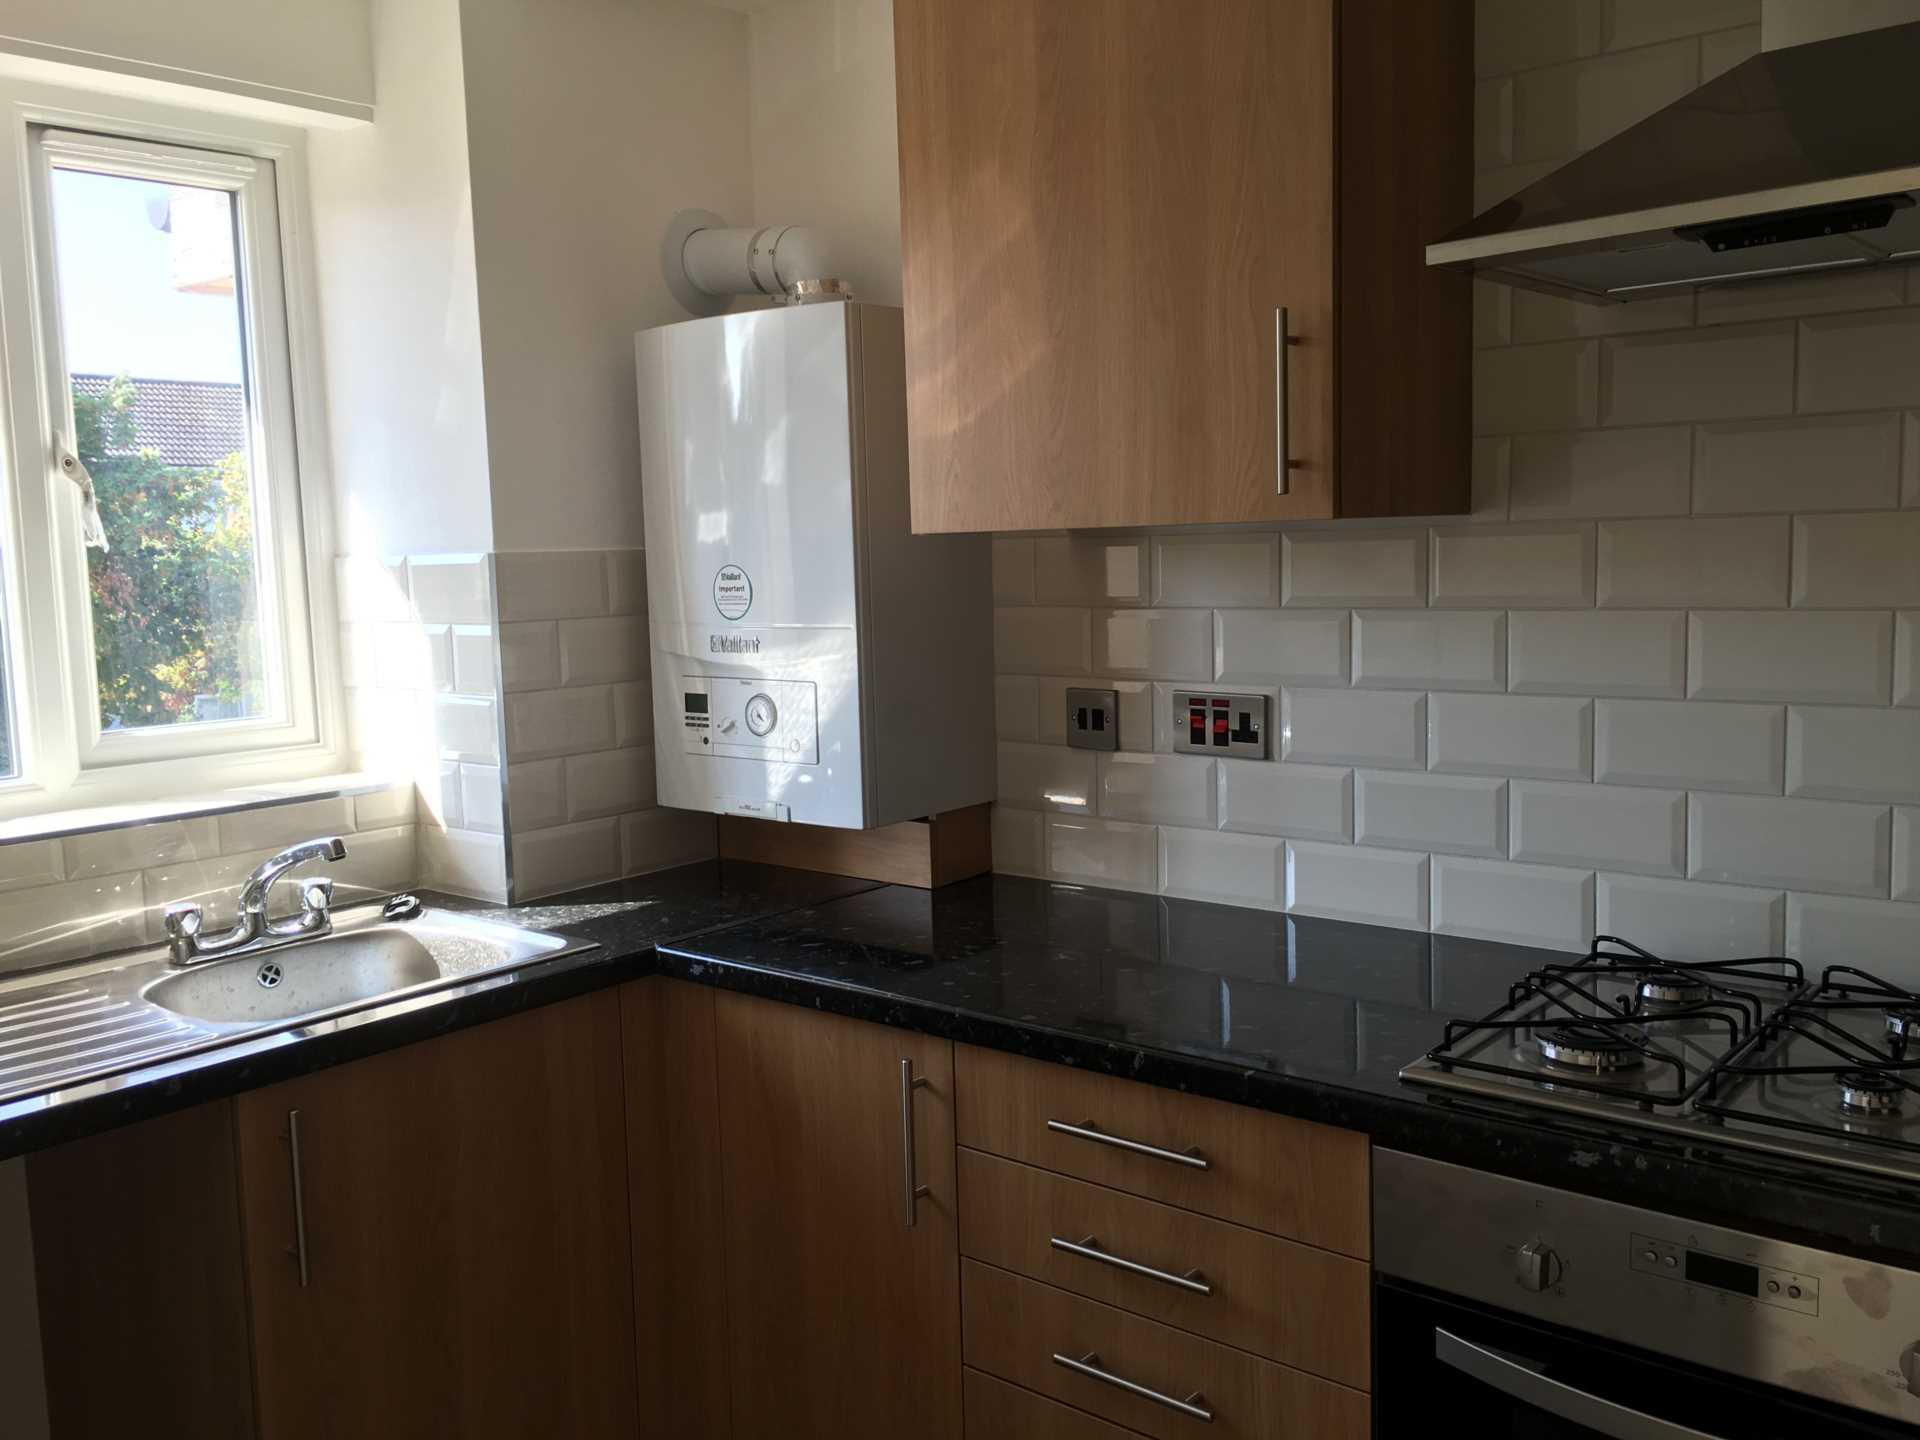 Aura Residential - 1 Bedroom Flat, Honey Close, Dagenham